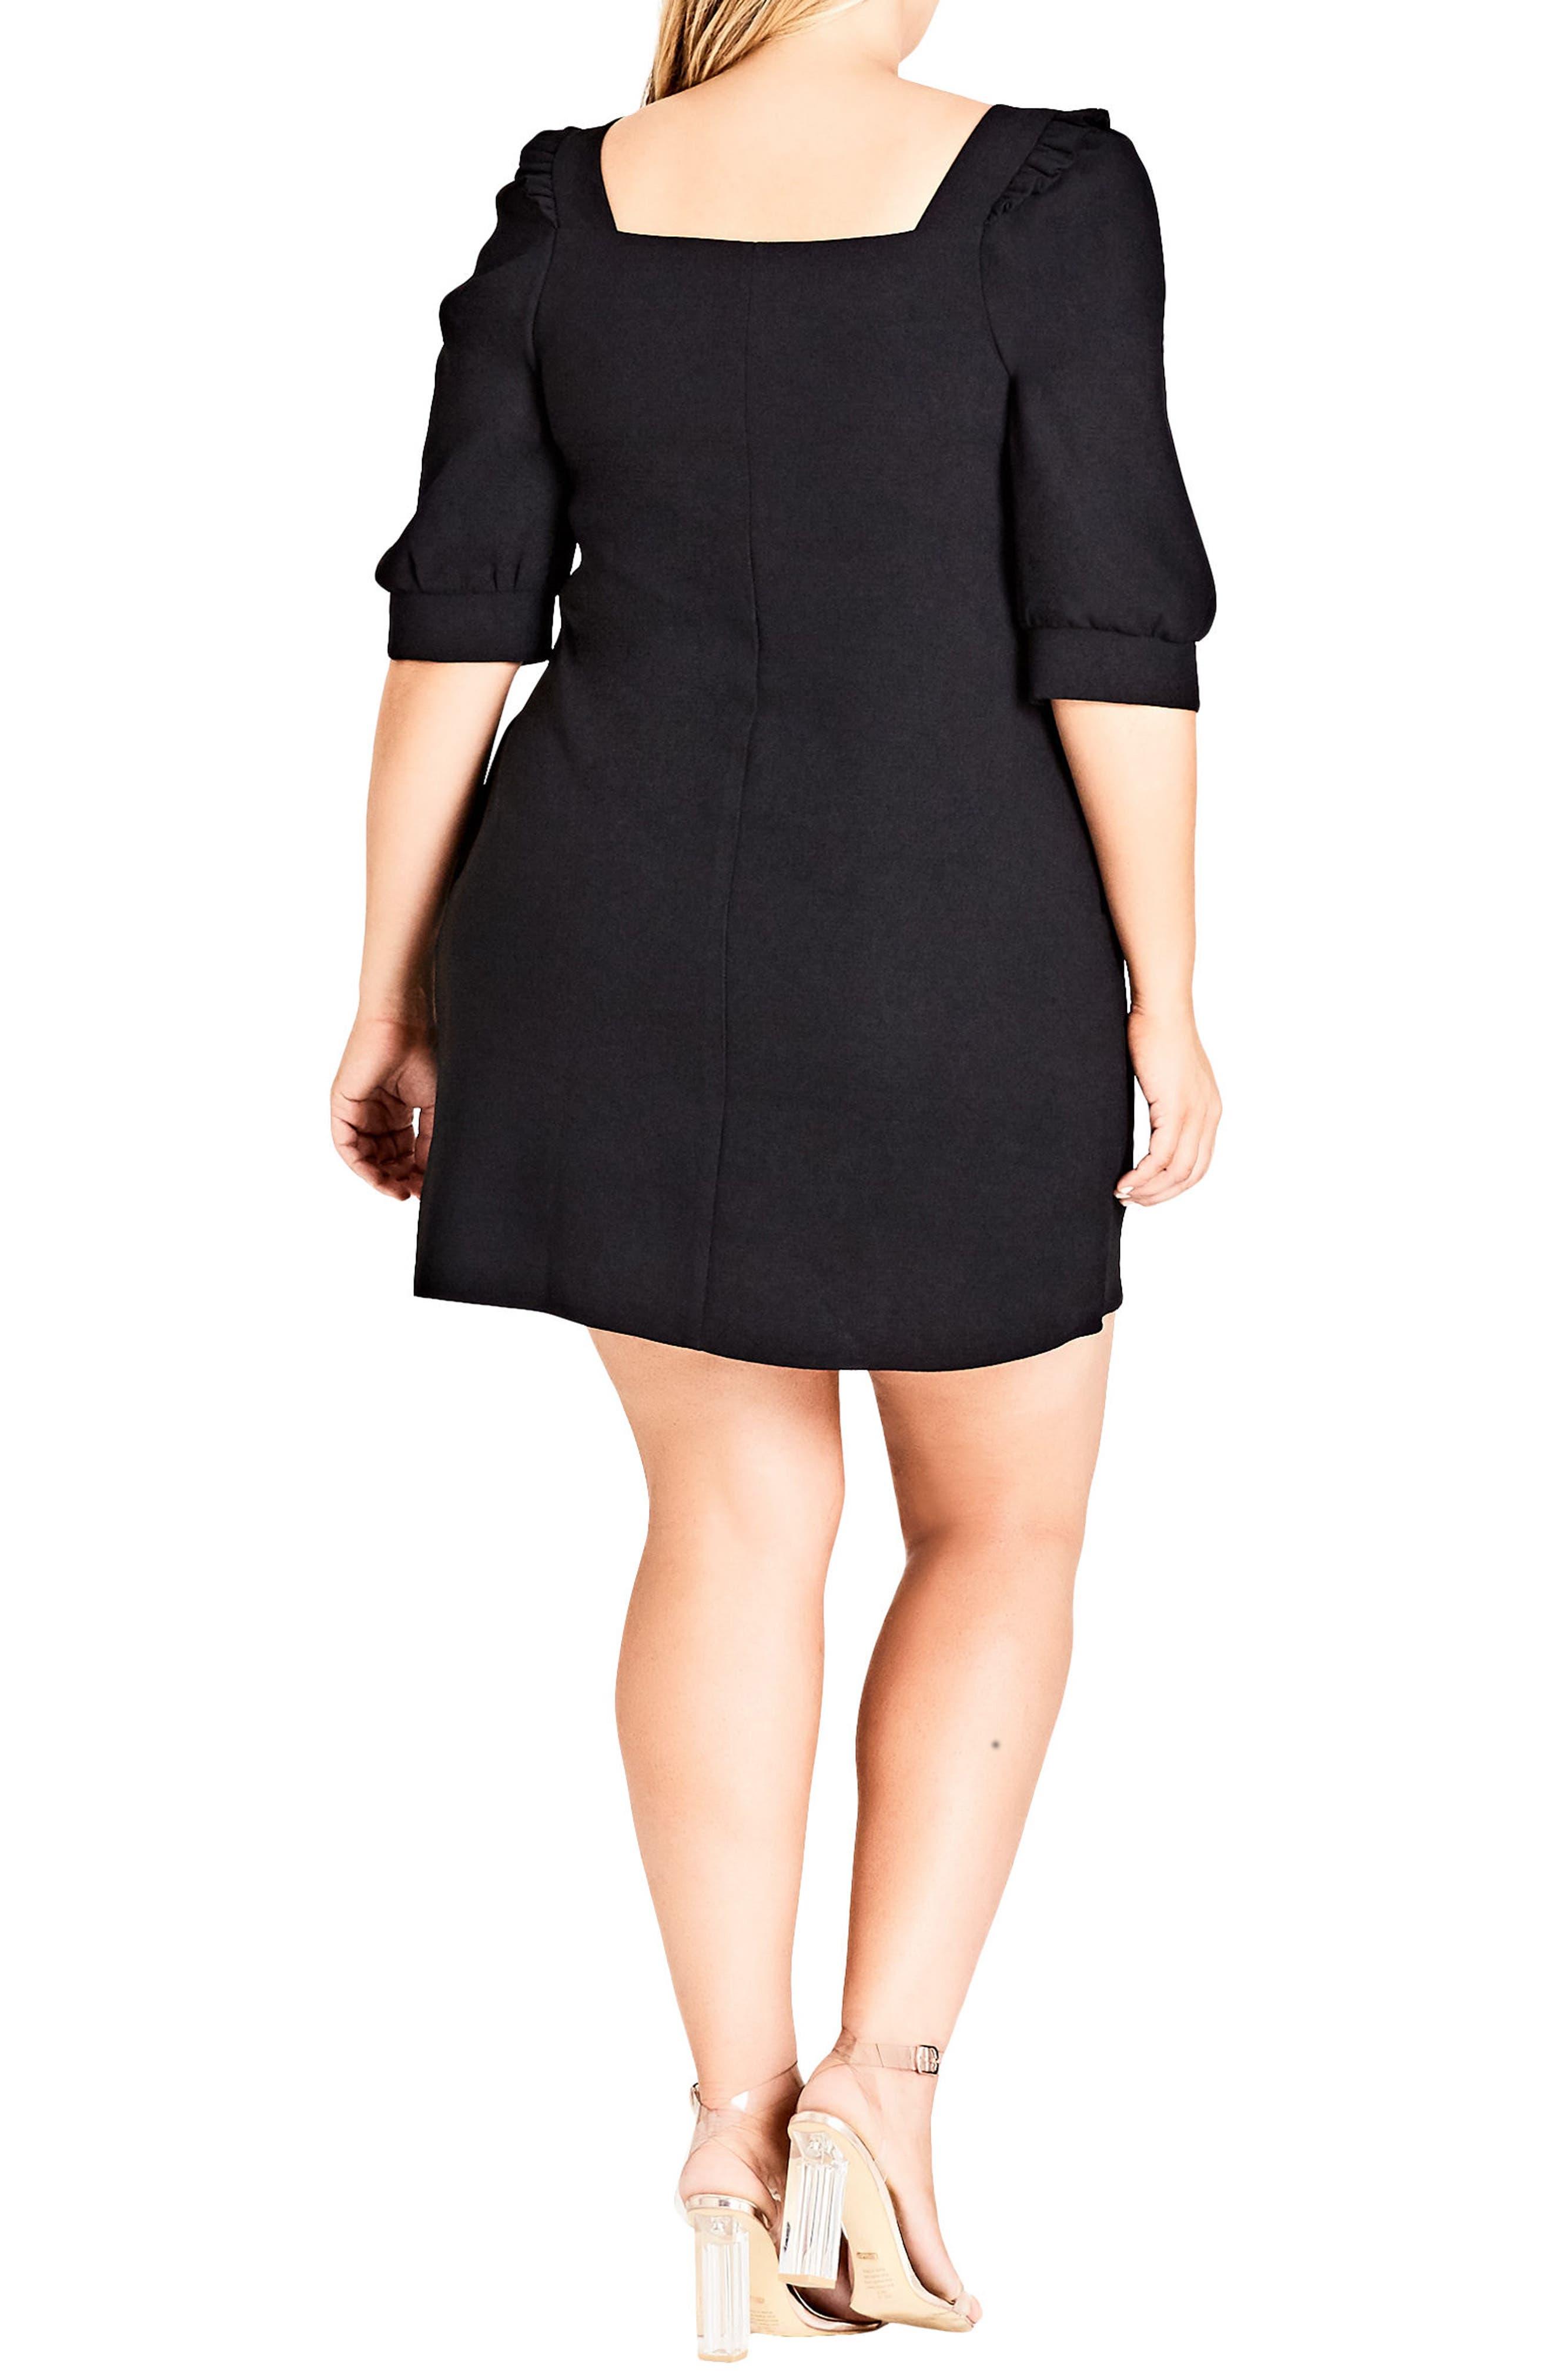 Darling Square Neck Dress,                             Alternate thumbnail 2, color,                             BLACK